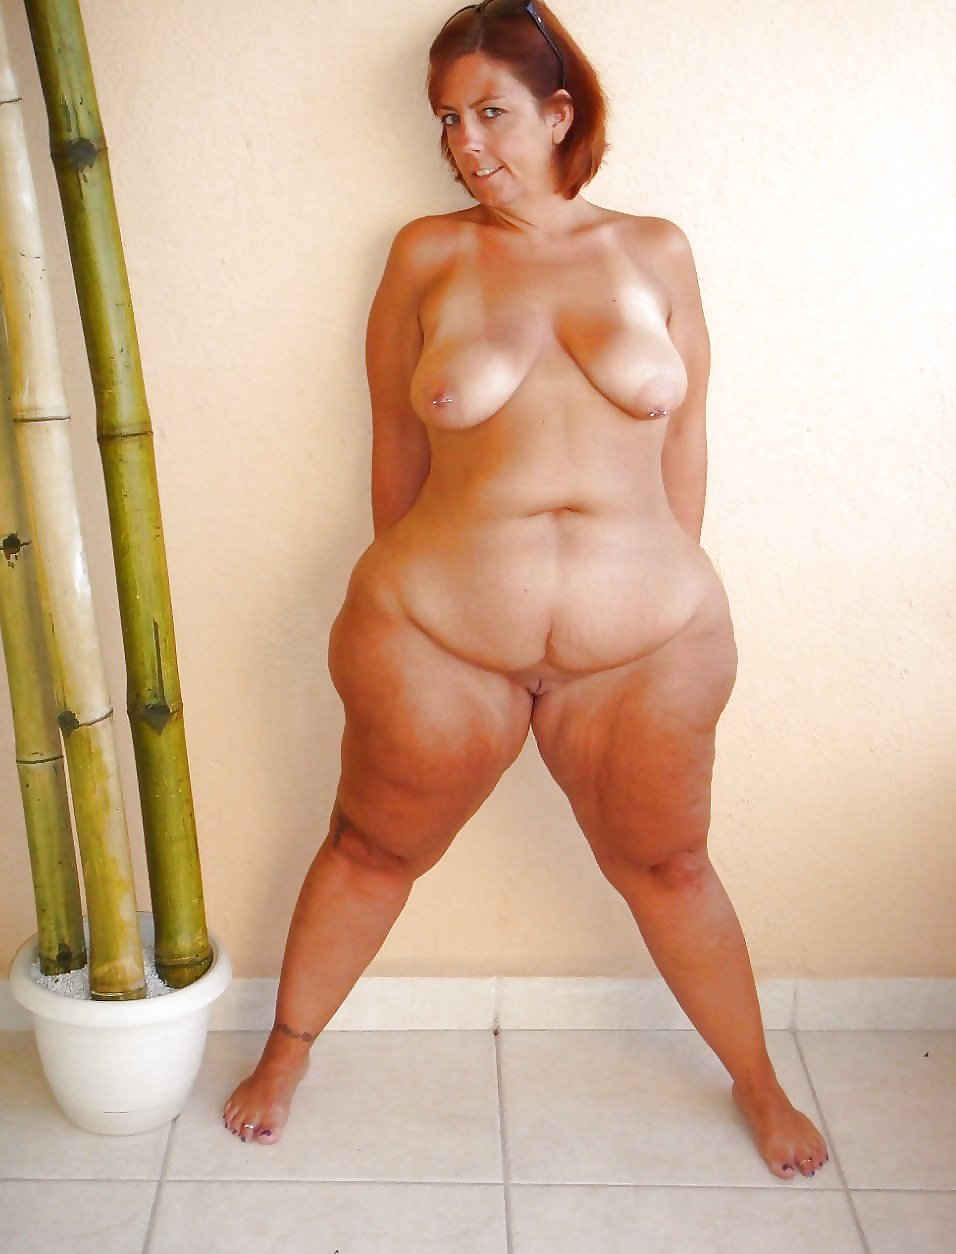 Nude Mature Women With Wide Hips Big Ass